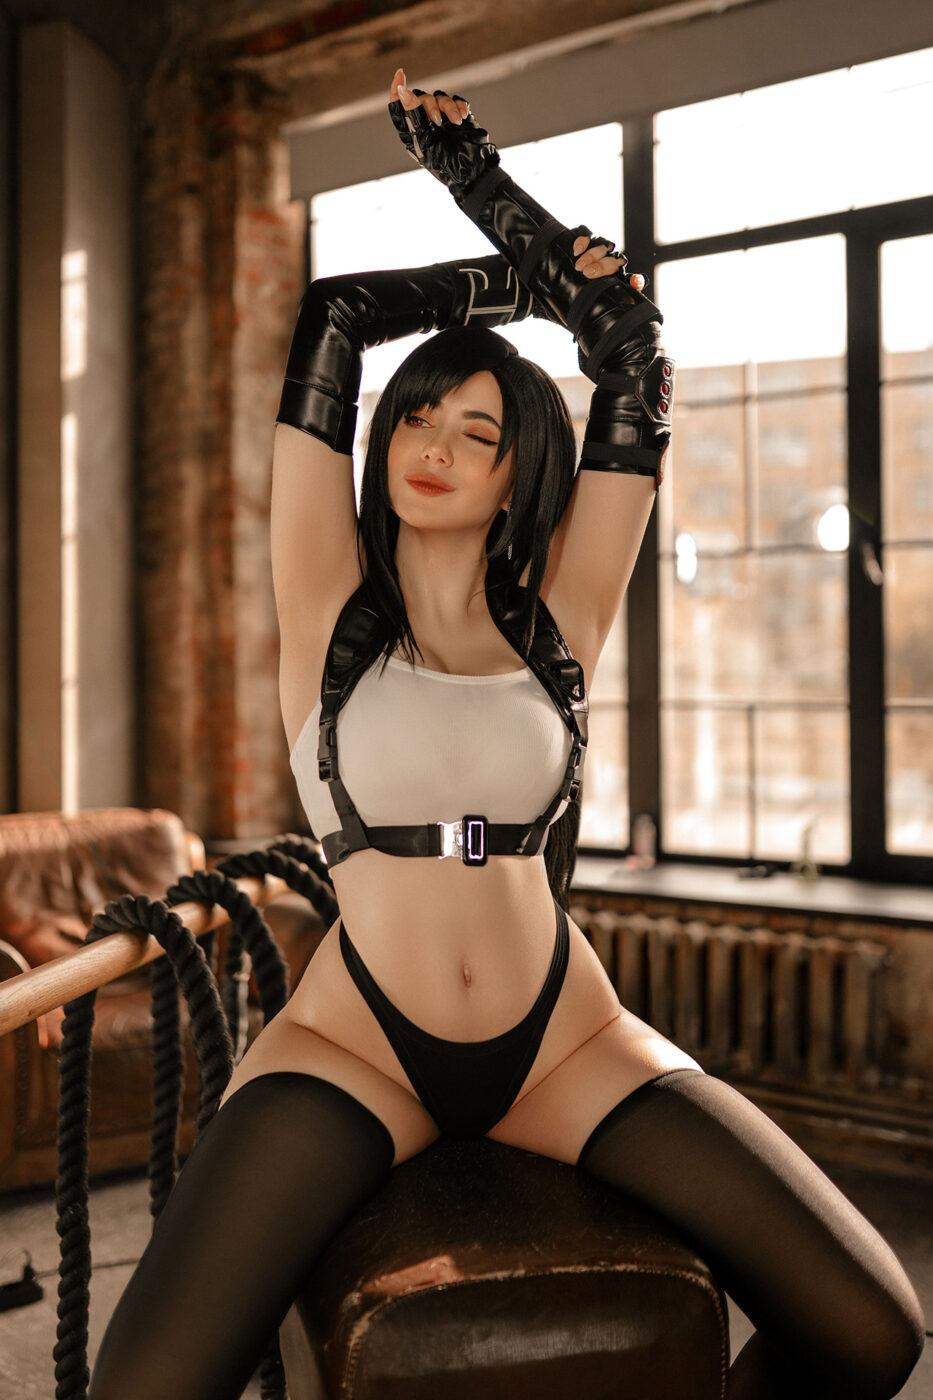 alina becker cosplay tifa lockhart final fantasy 3